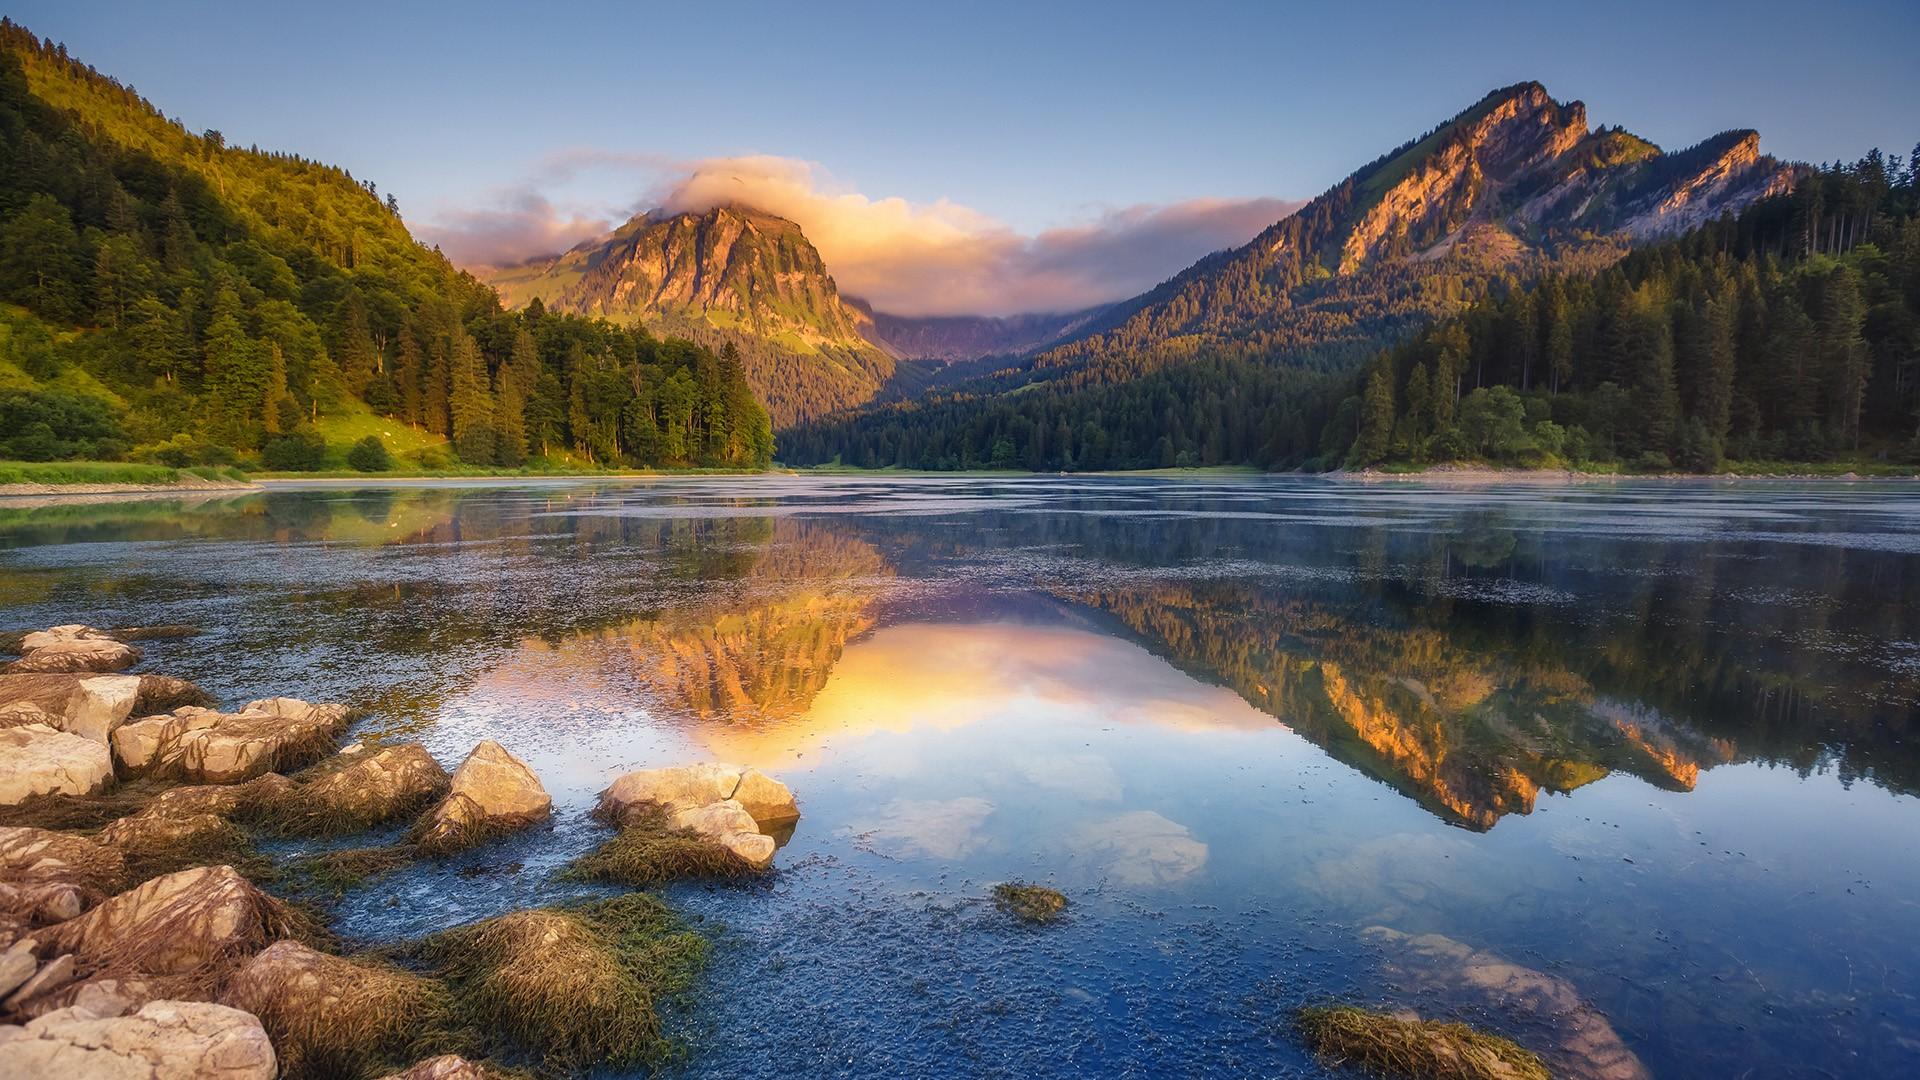 Lake Obersee under sunlight, Näfels, Mount Brunnelistock, Swiss Alps, Switzerland | Windows 10 ...